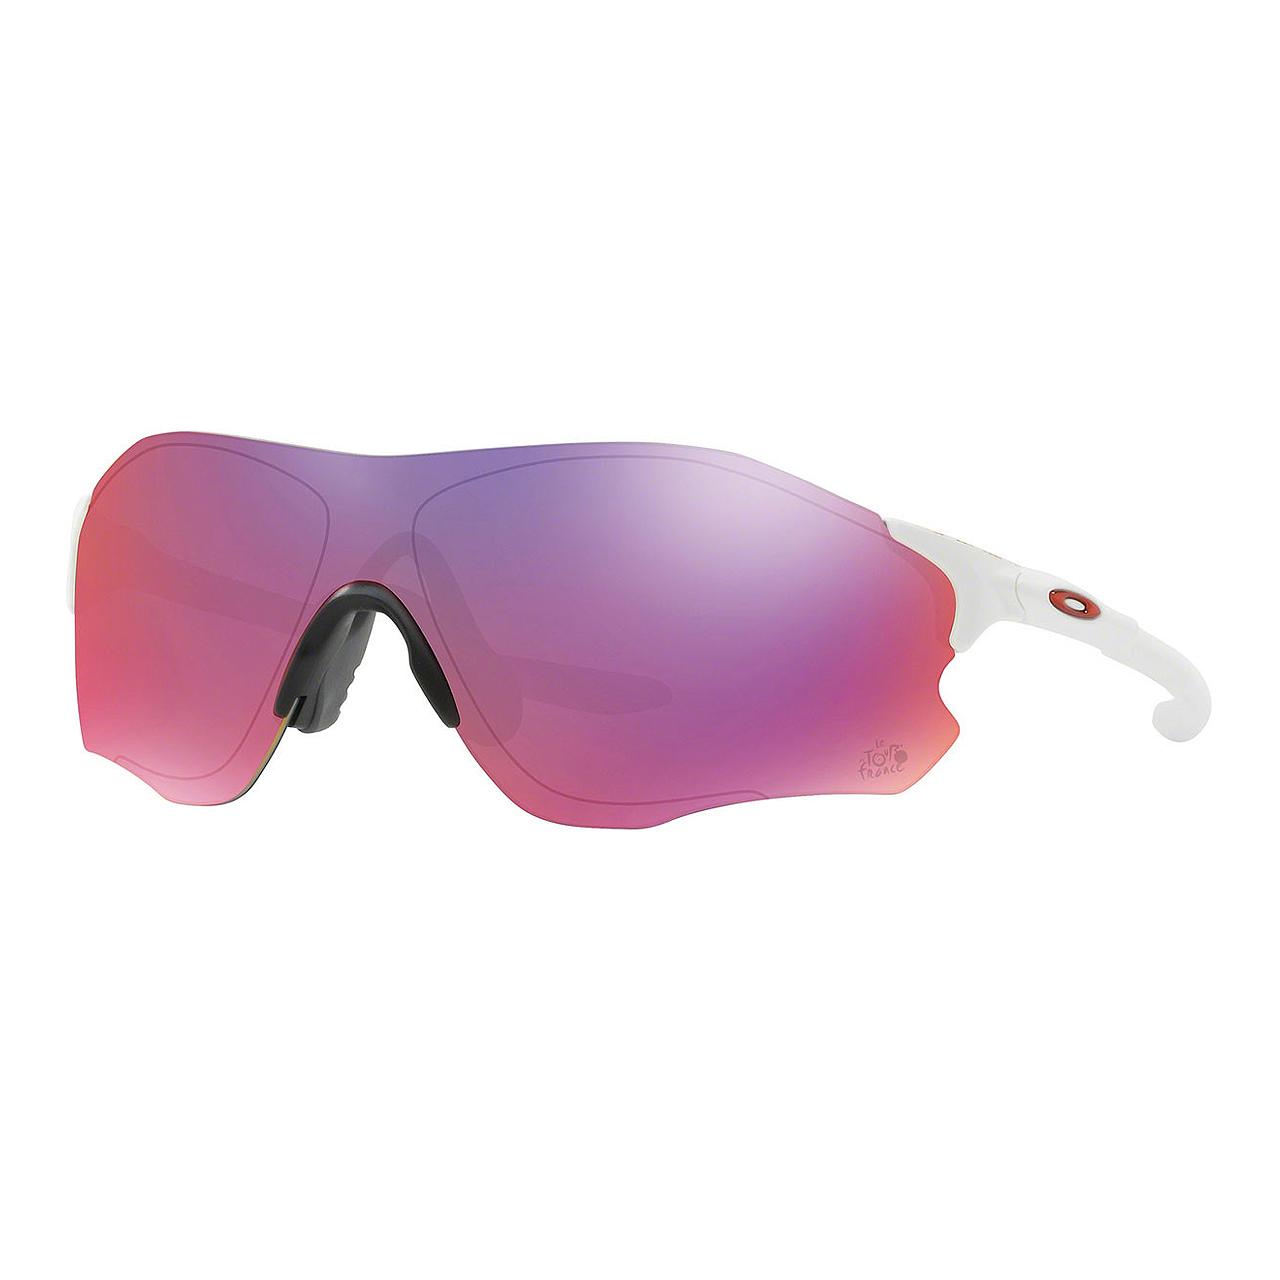 عینک آفتابی اوکلی مدل EVZero Path Tour de France کد OO9308-1938 -  - 3